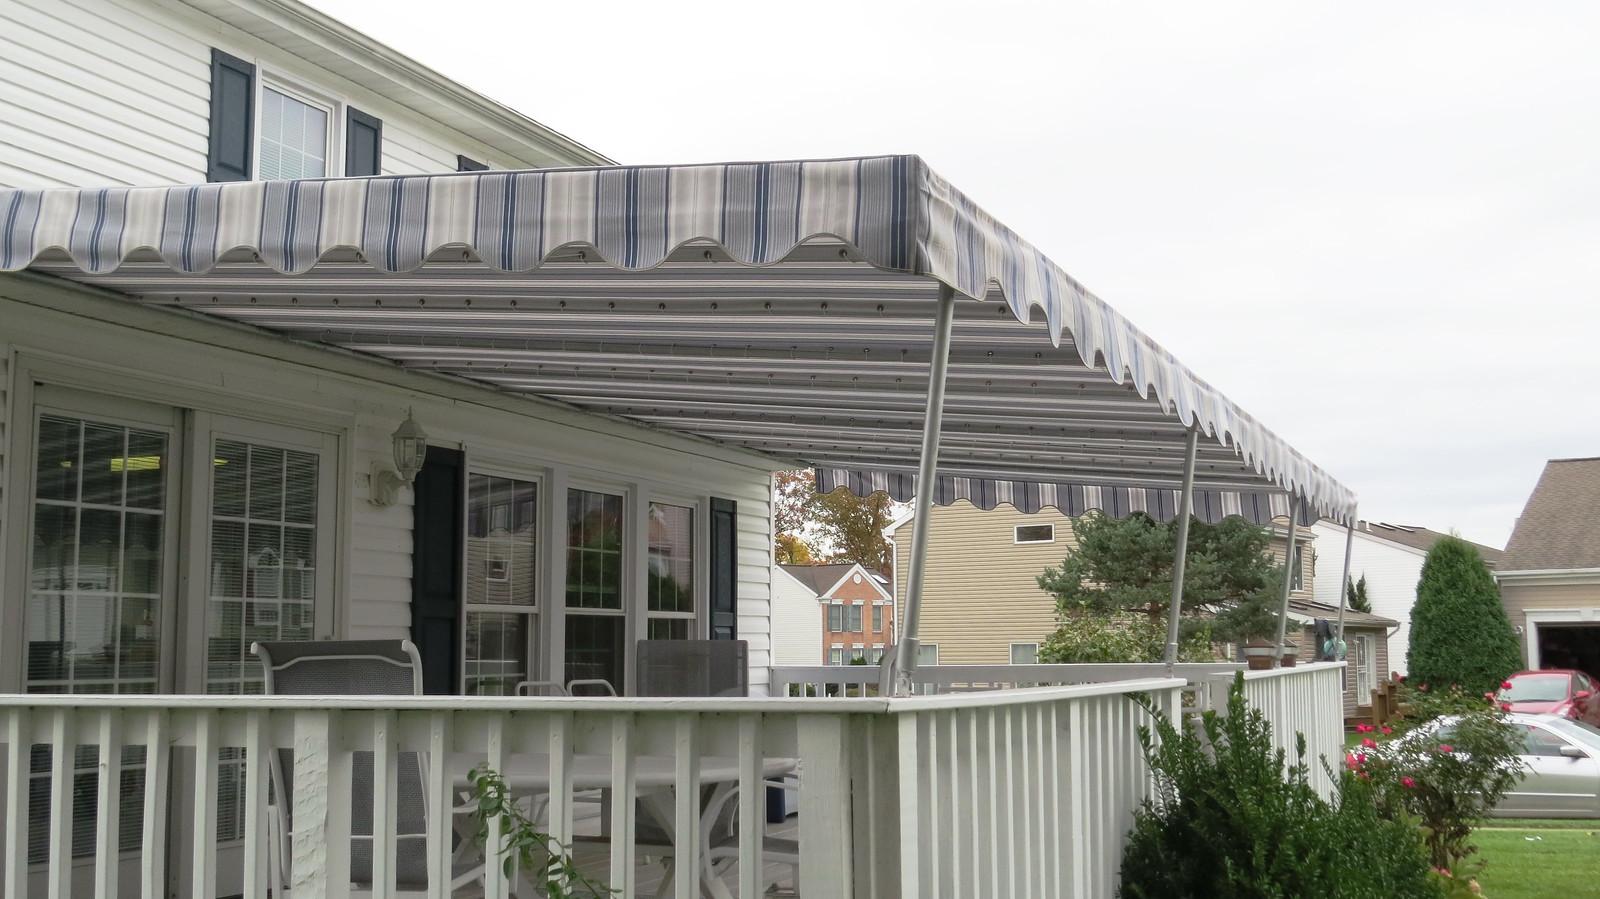 Deck Awning Maryland-Hoffman Awning